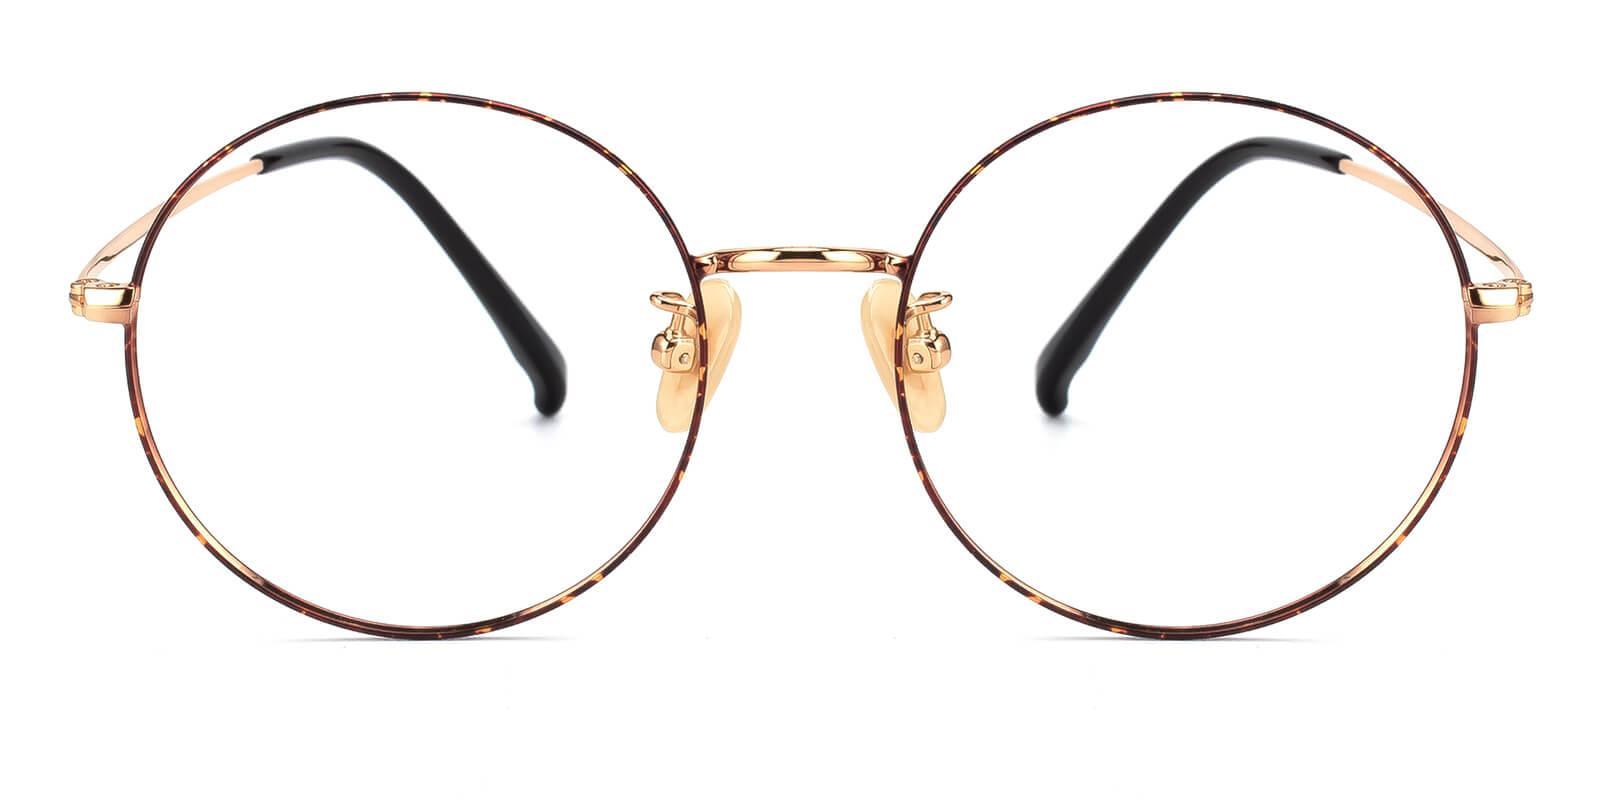 Theenity-Pattern-Round-Titanium-Eyeglasses-detail